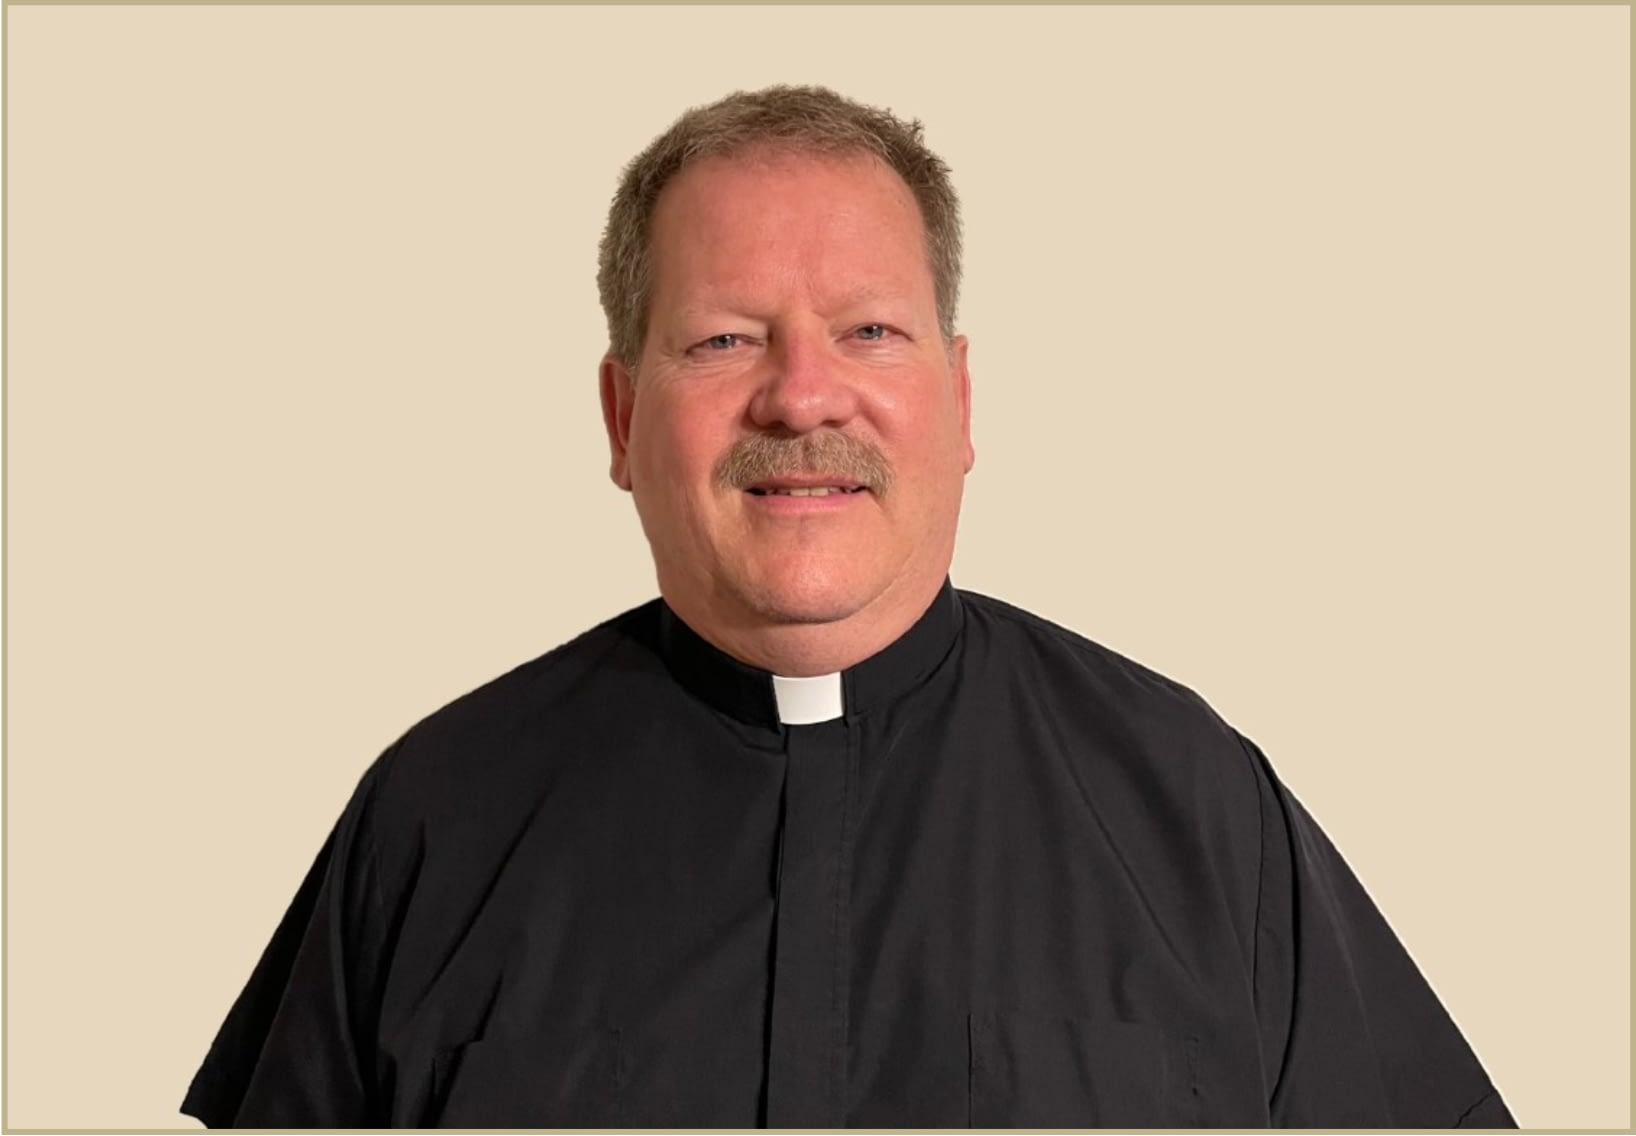 Fr. Joe Williams